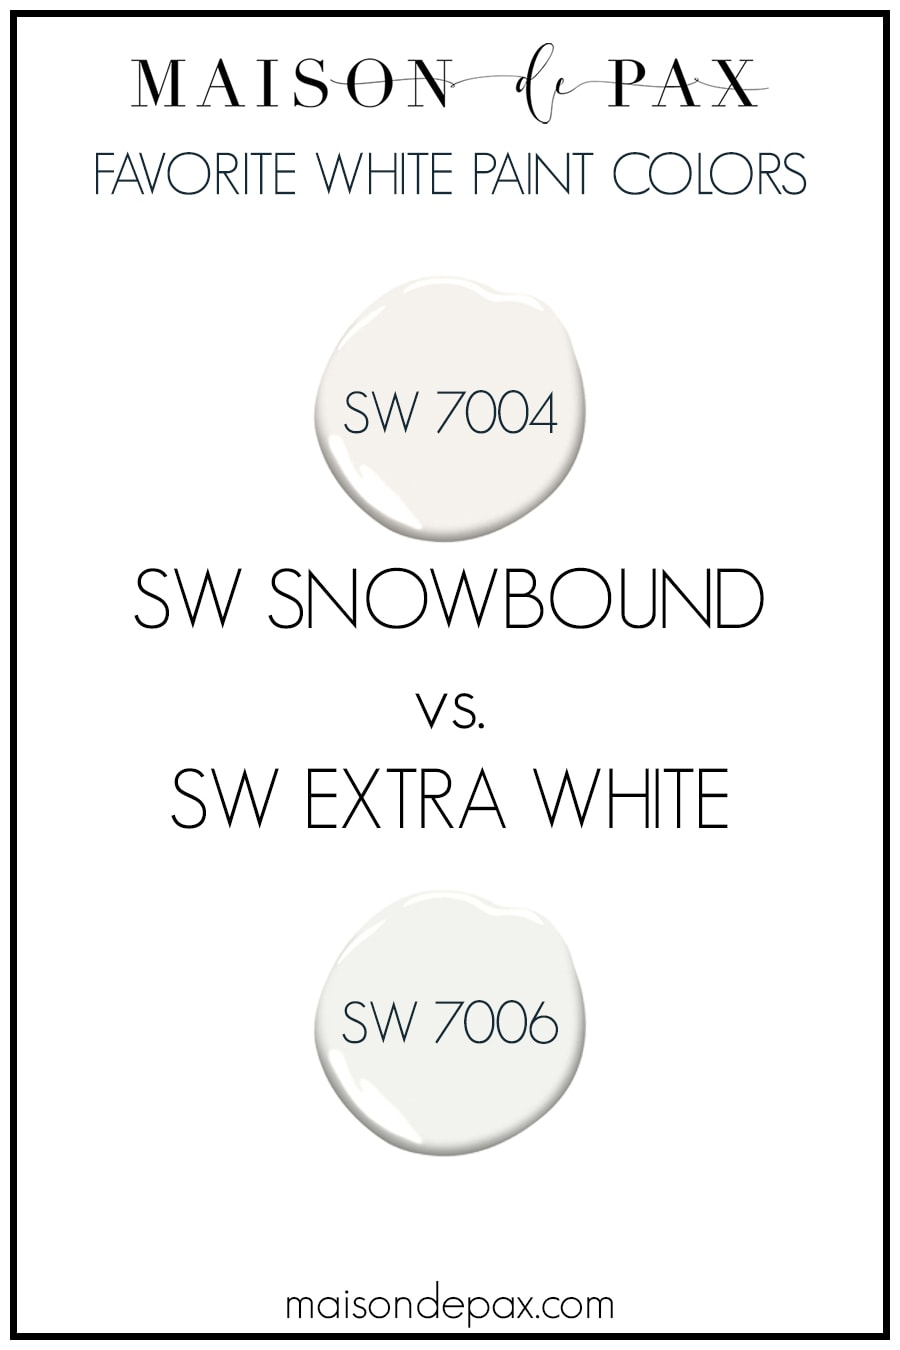 SW Snowmound v SW Extra White